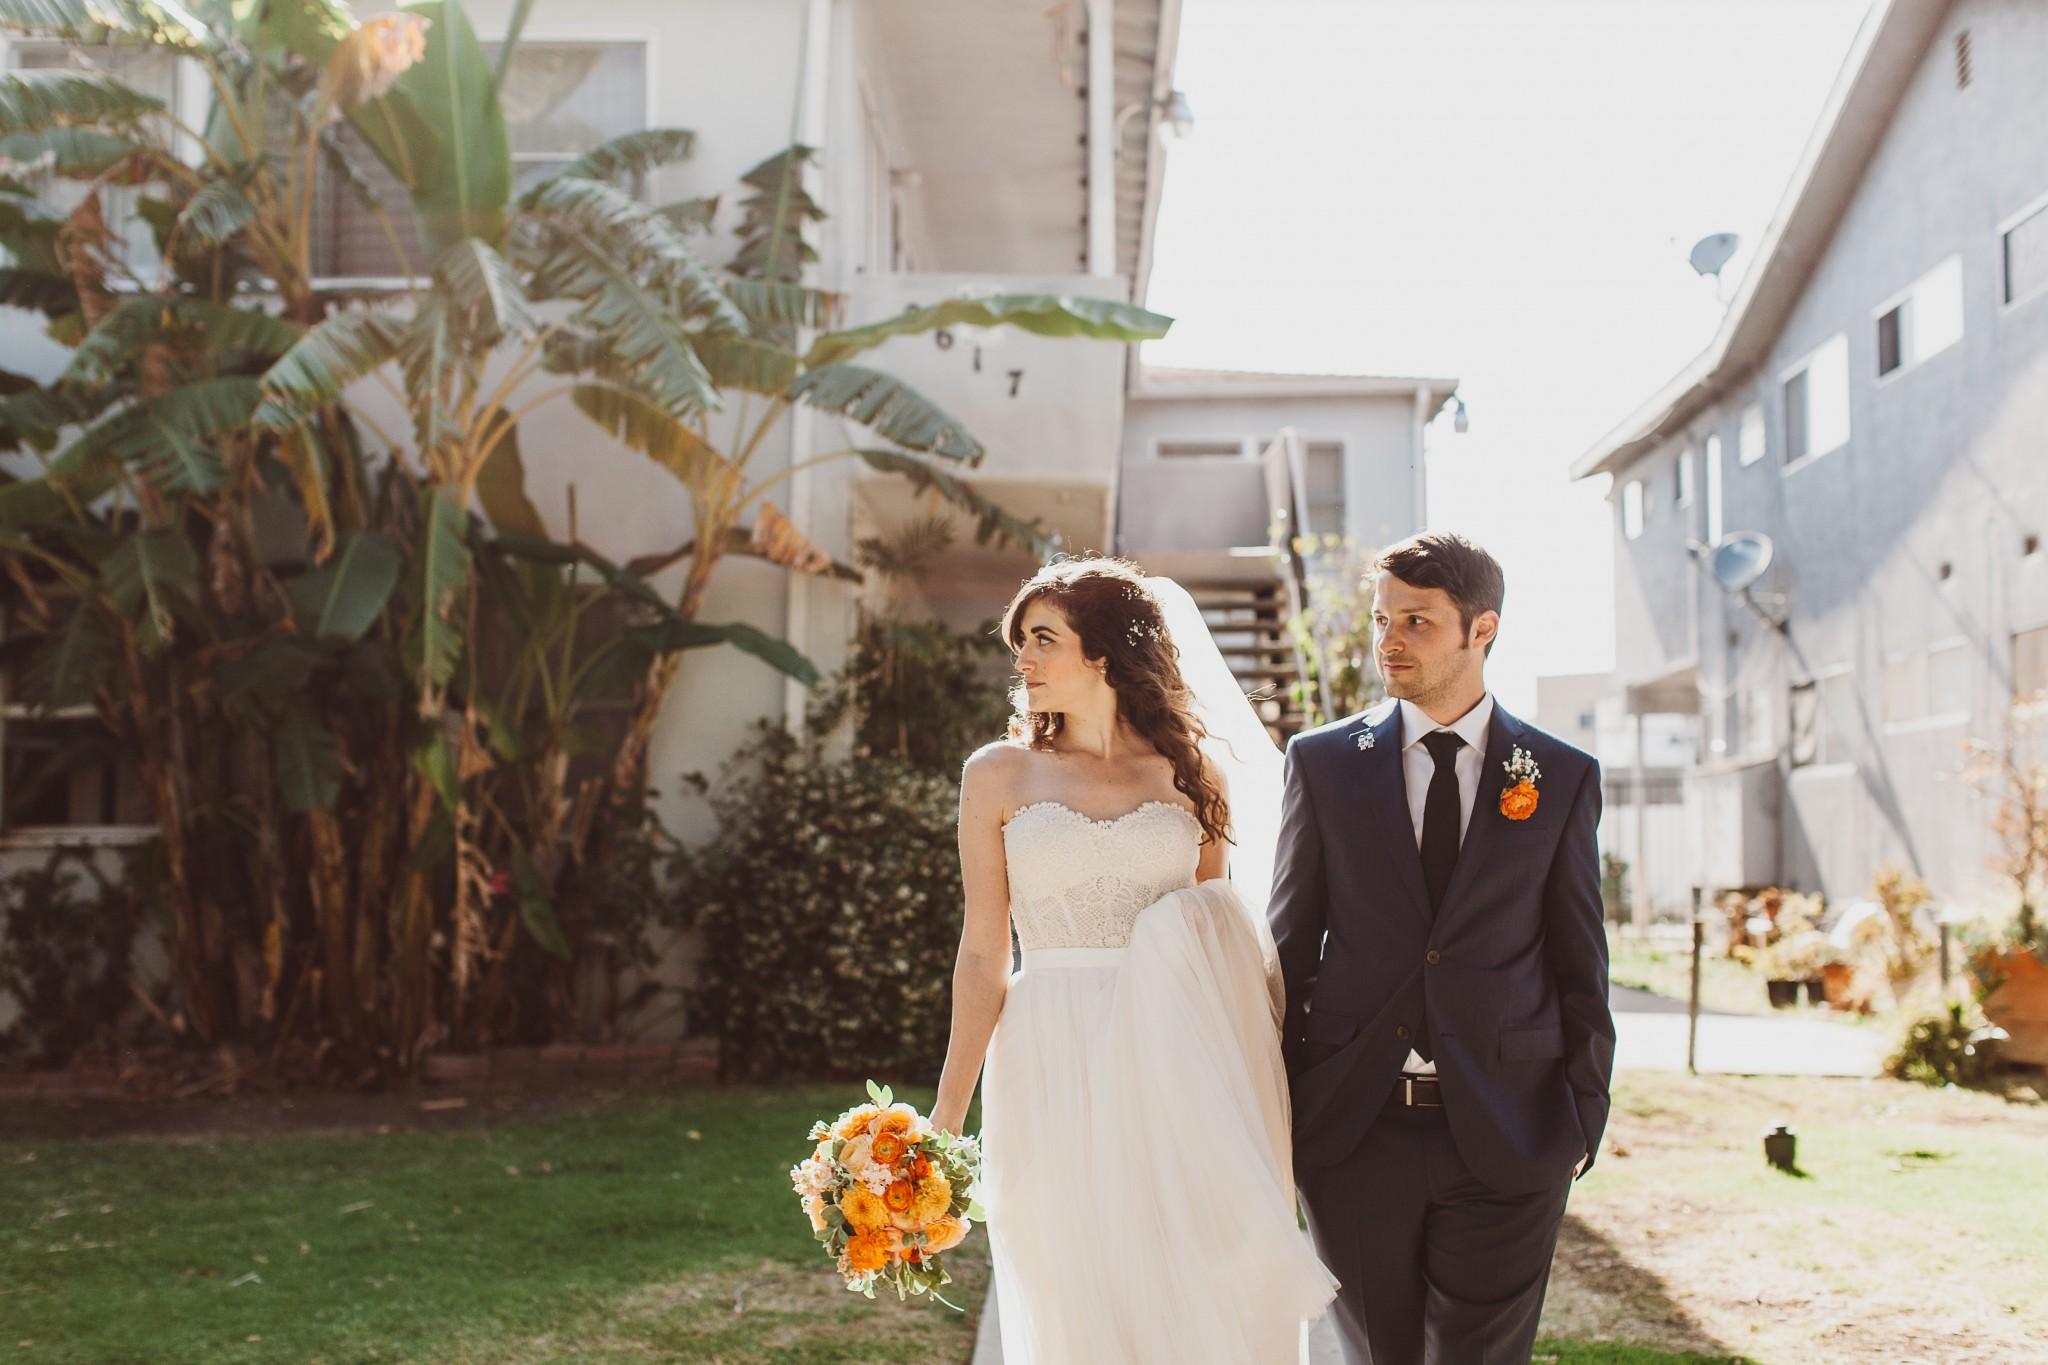 DrewAimee-Married_stevecowellphoto-2180.jpg